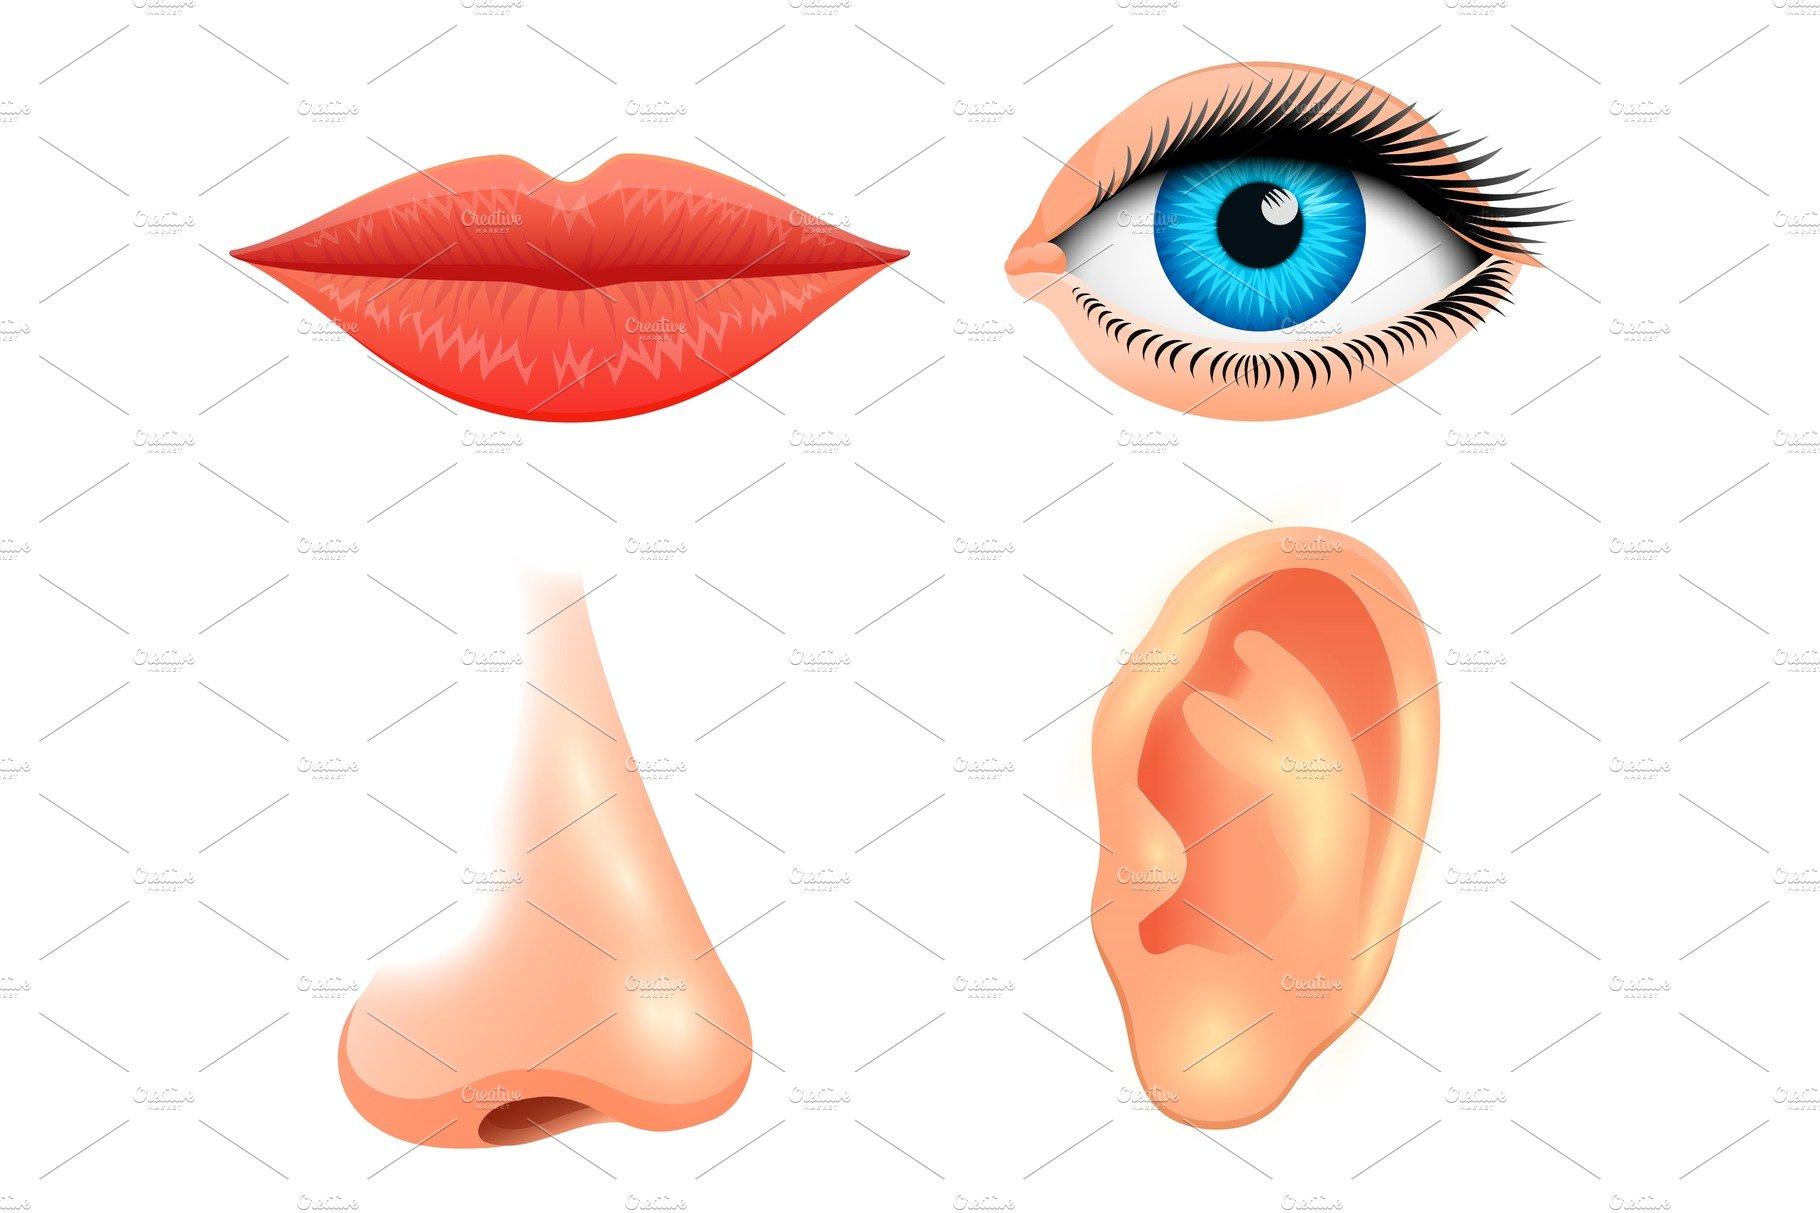 Human Biology Sensory Organs Illustrations Creative Market